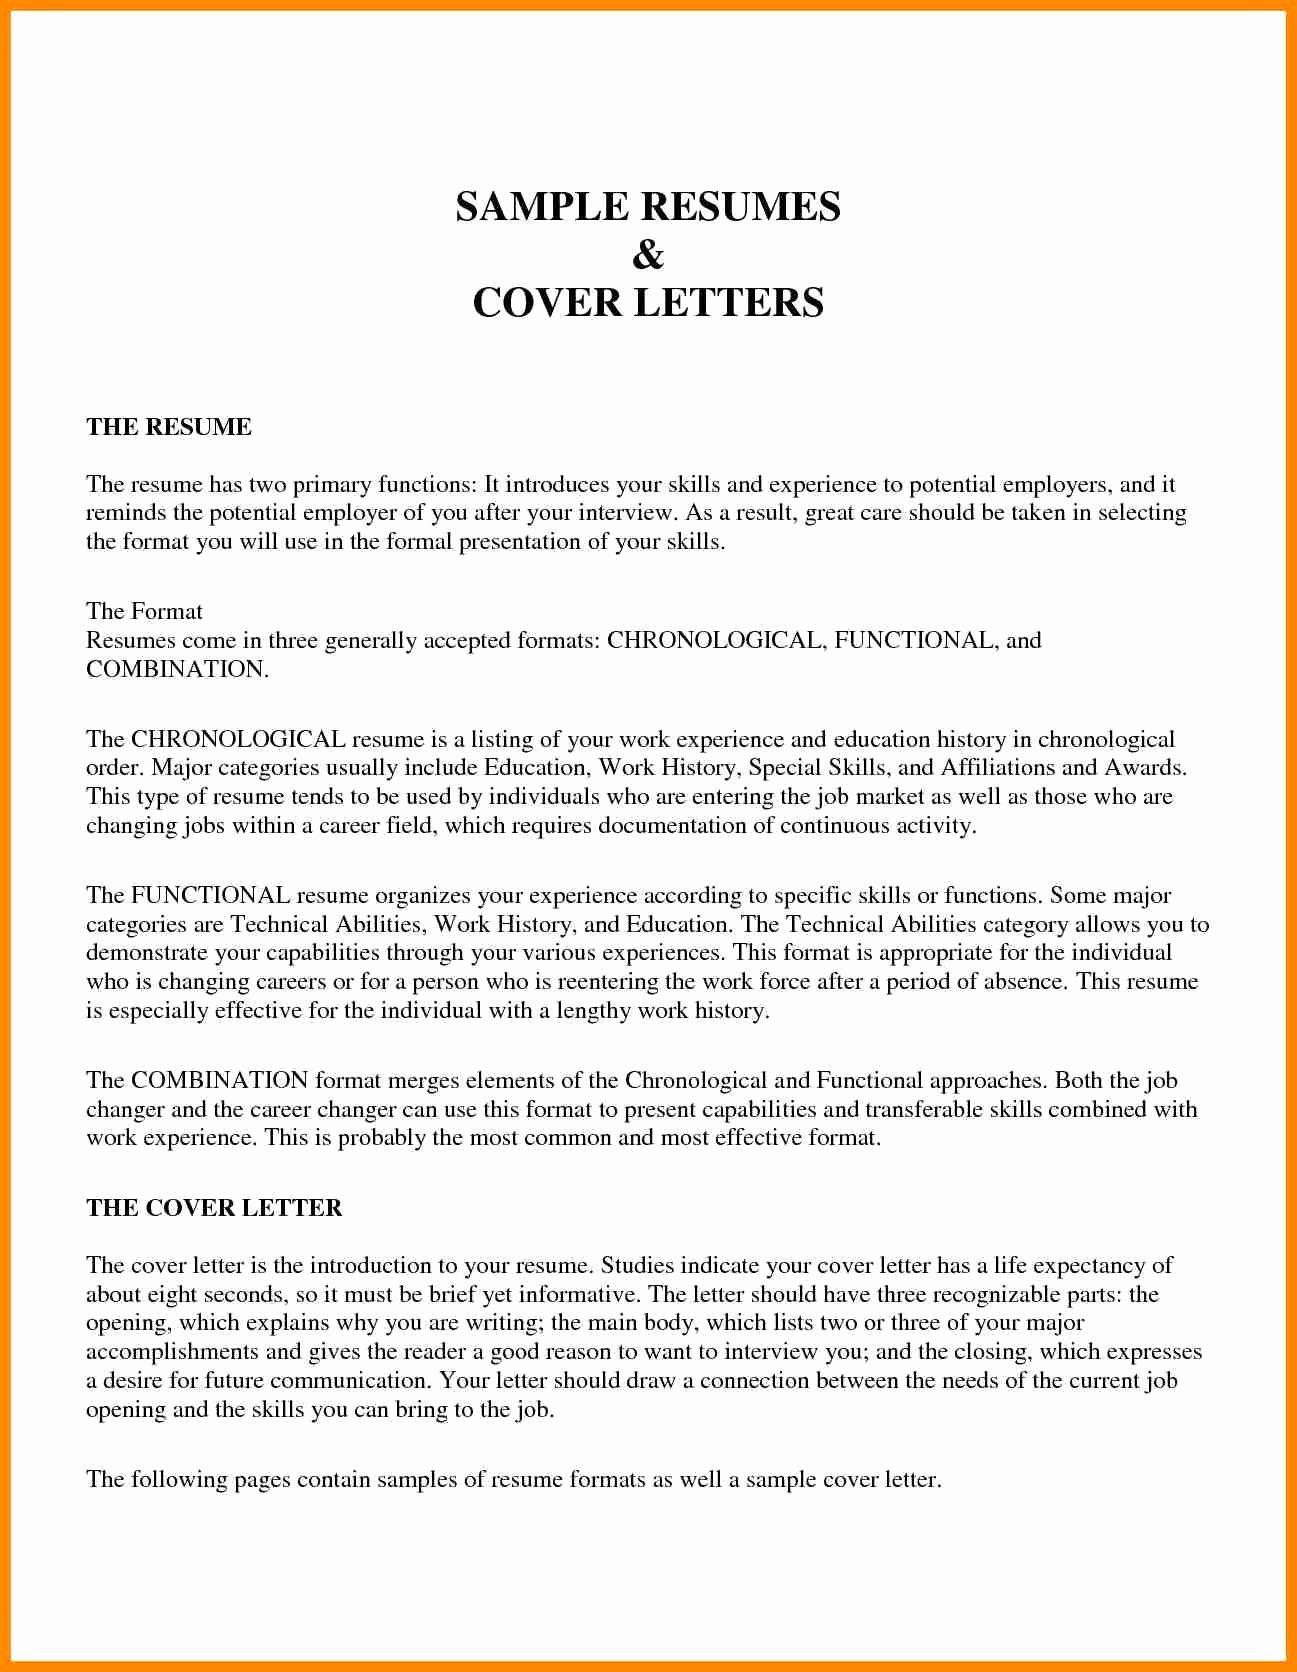 Cover Letter format Google Docs Elegant Free Cover Letter Template Google Docs Download